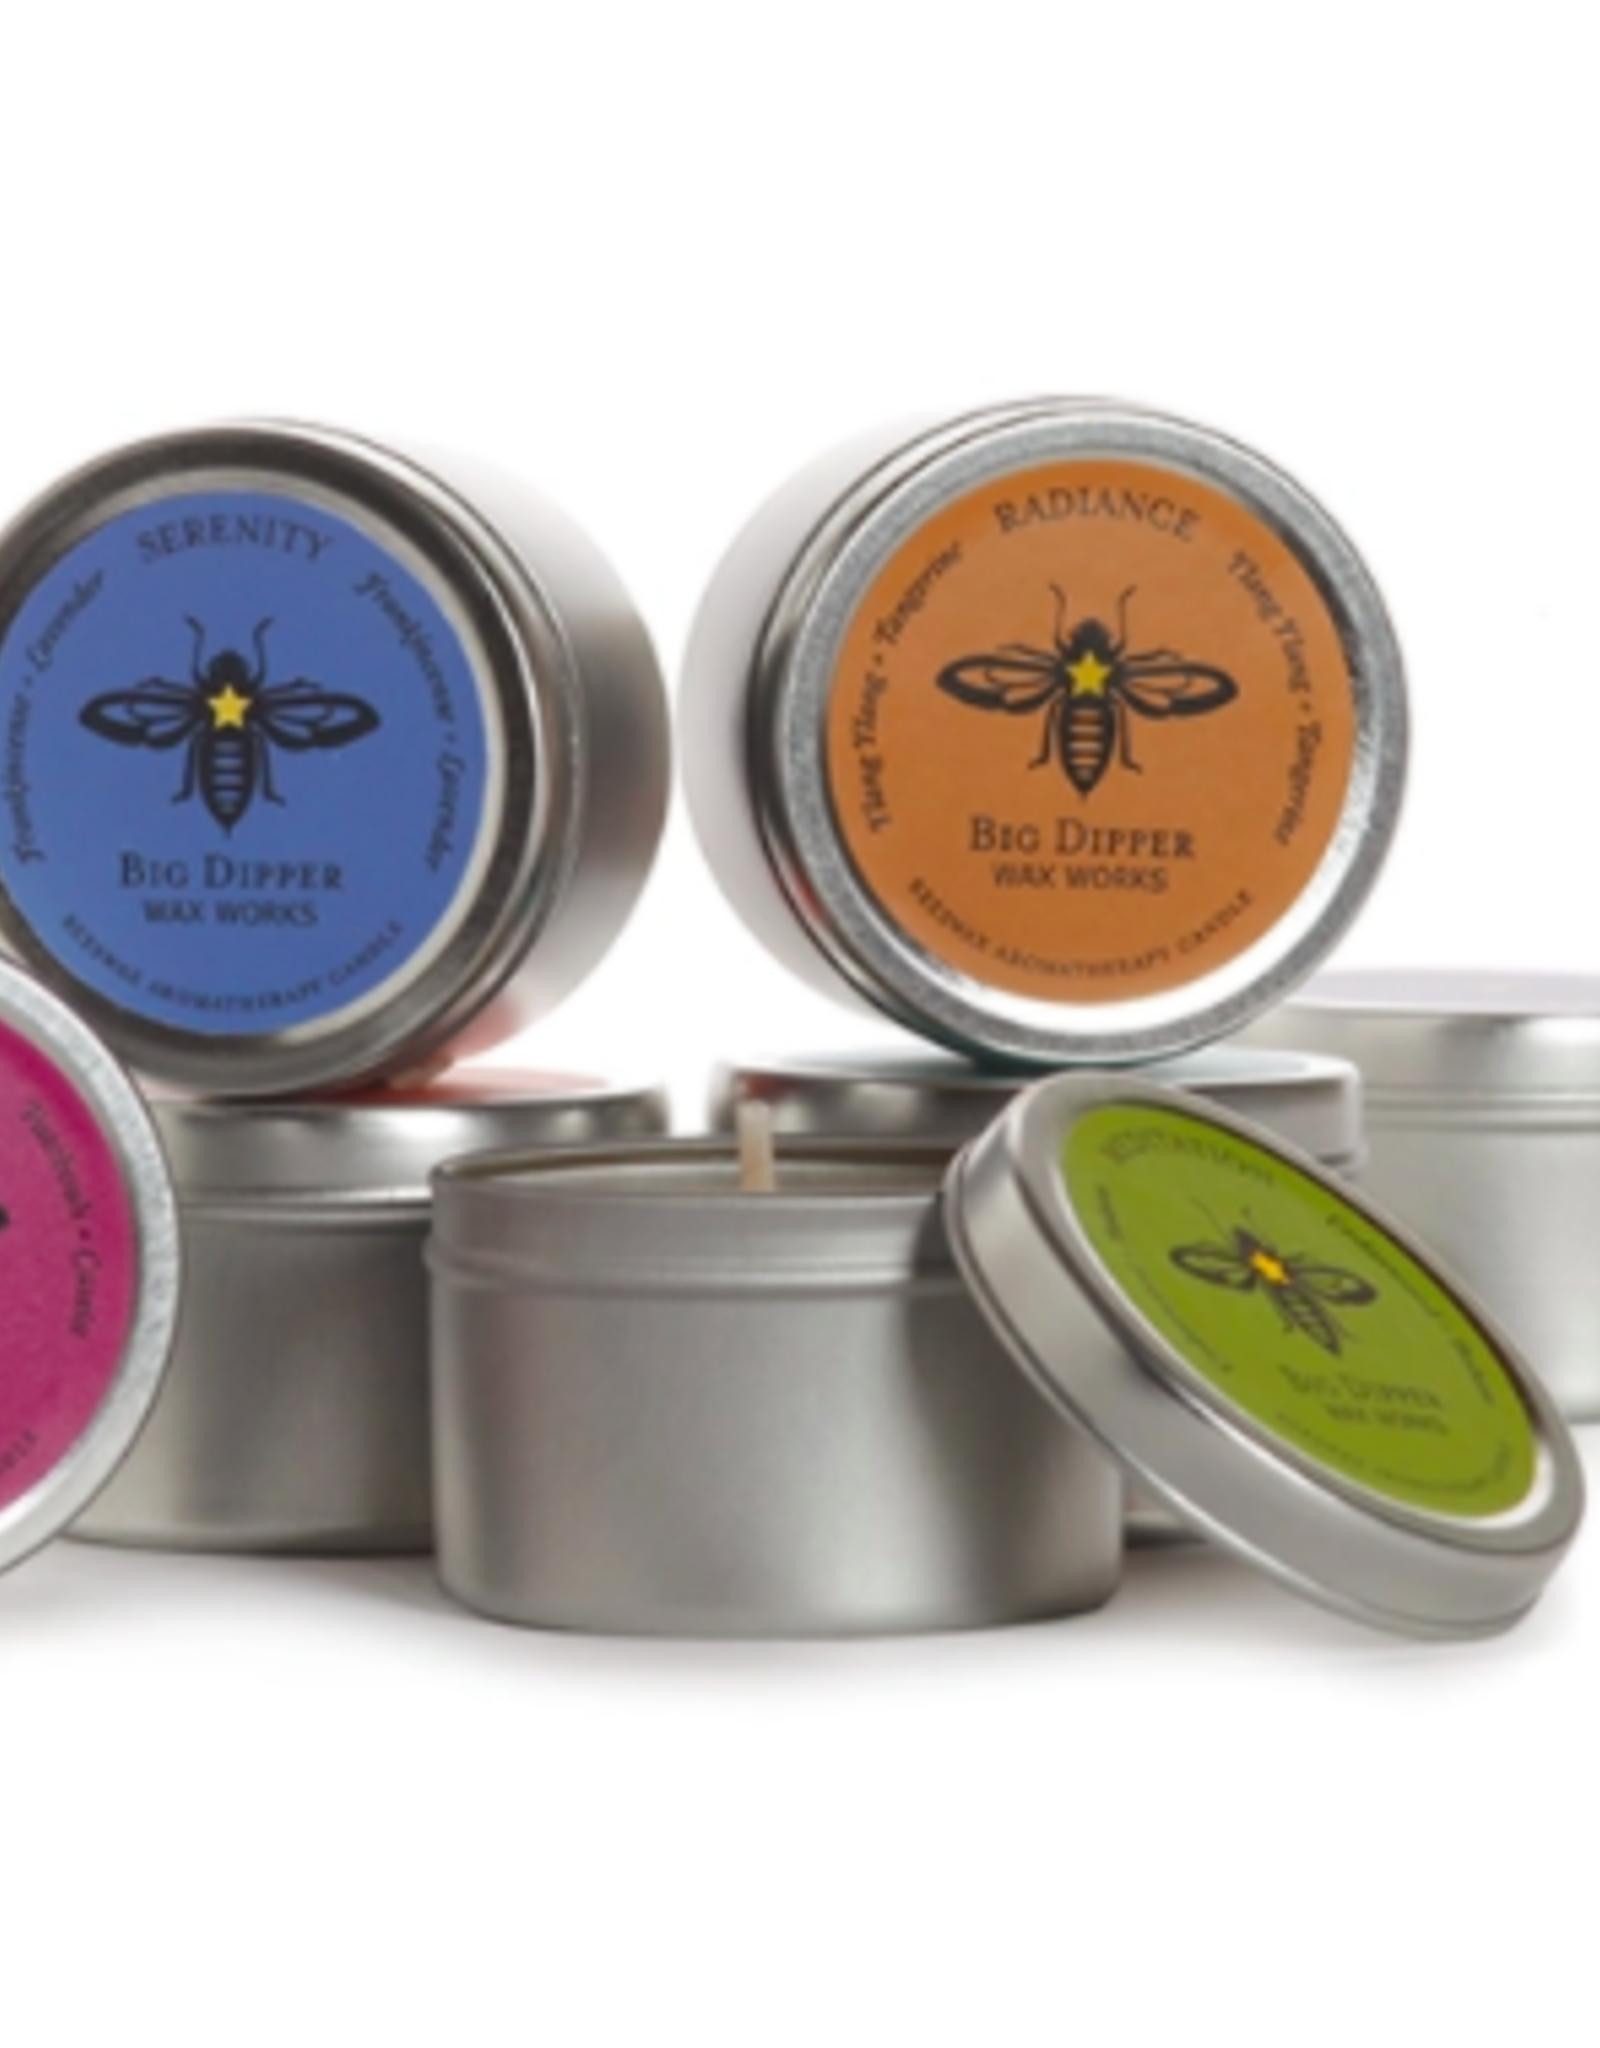 Big Dipper 1.7 oz. Aromatherapy Candle Tins